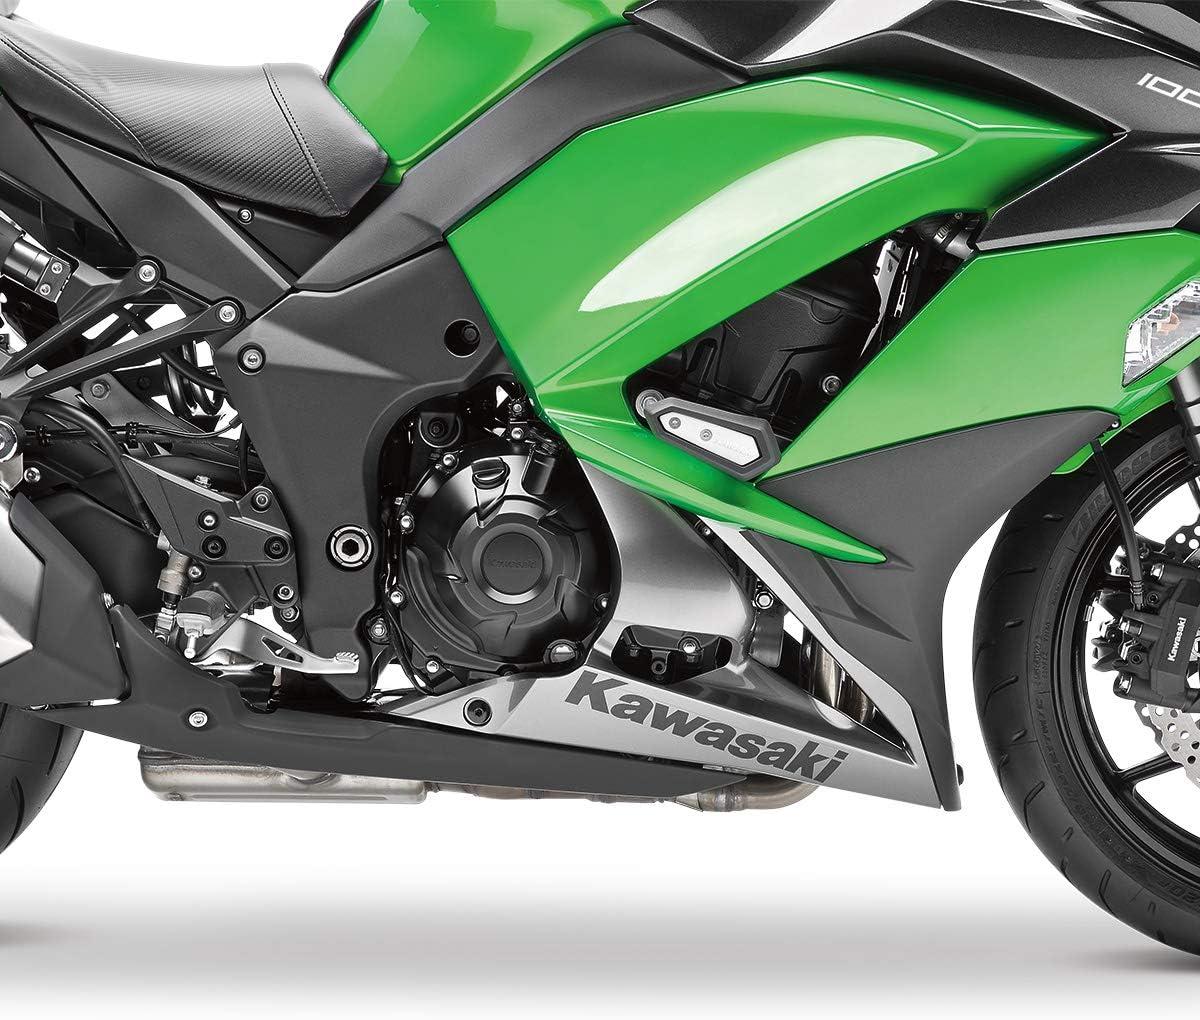 Kawasaki 2017-2019 Ninja 1000 Abs Crankcase Protector 99994-0951 New Oem